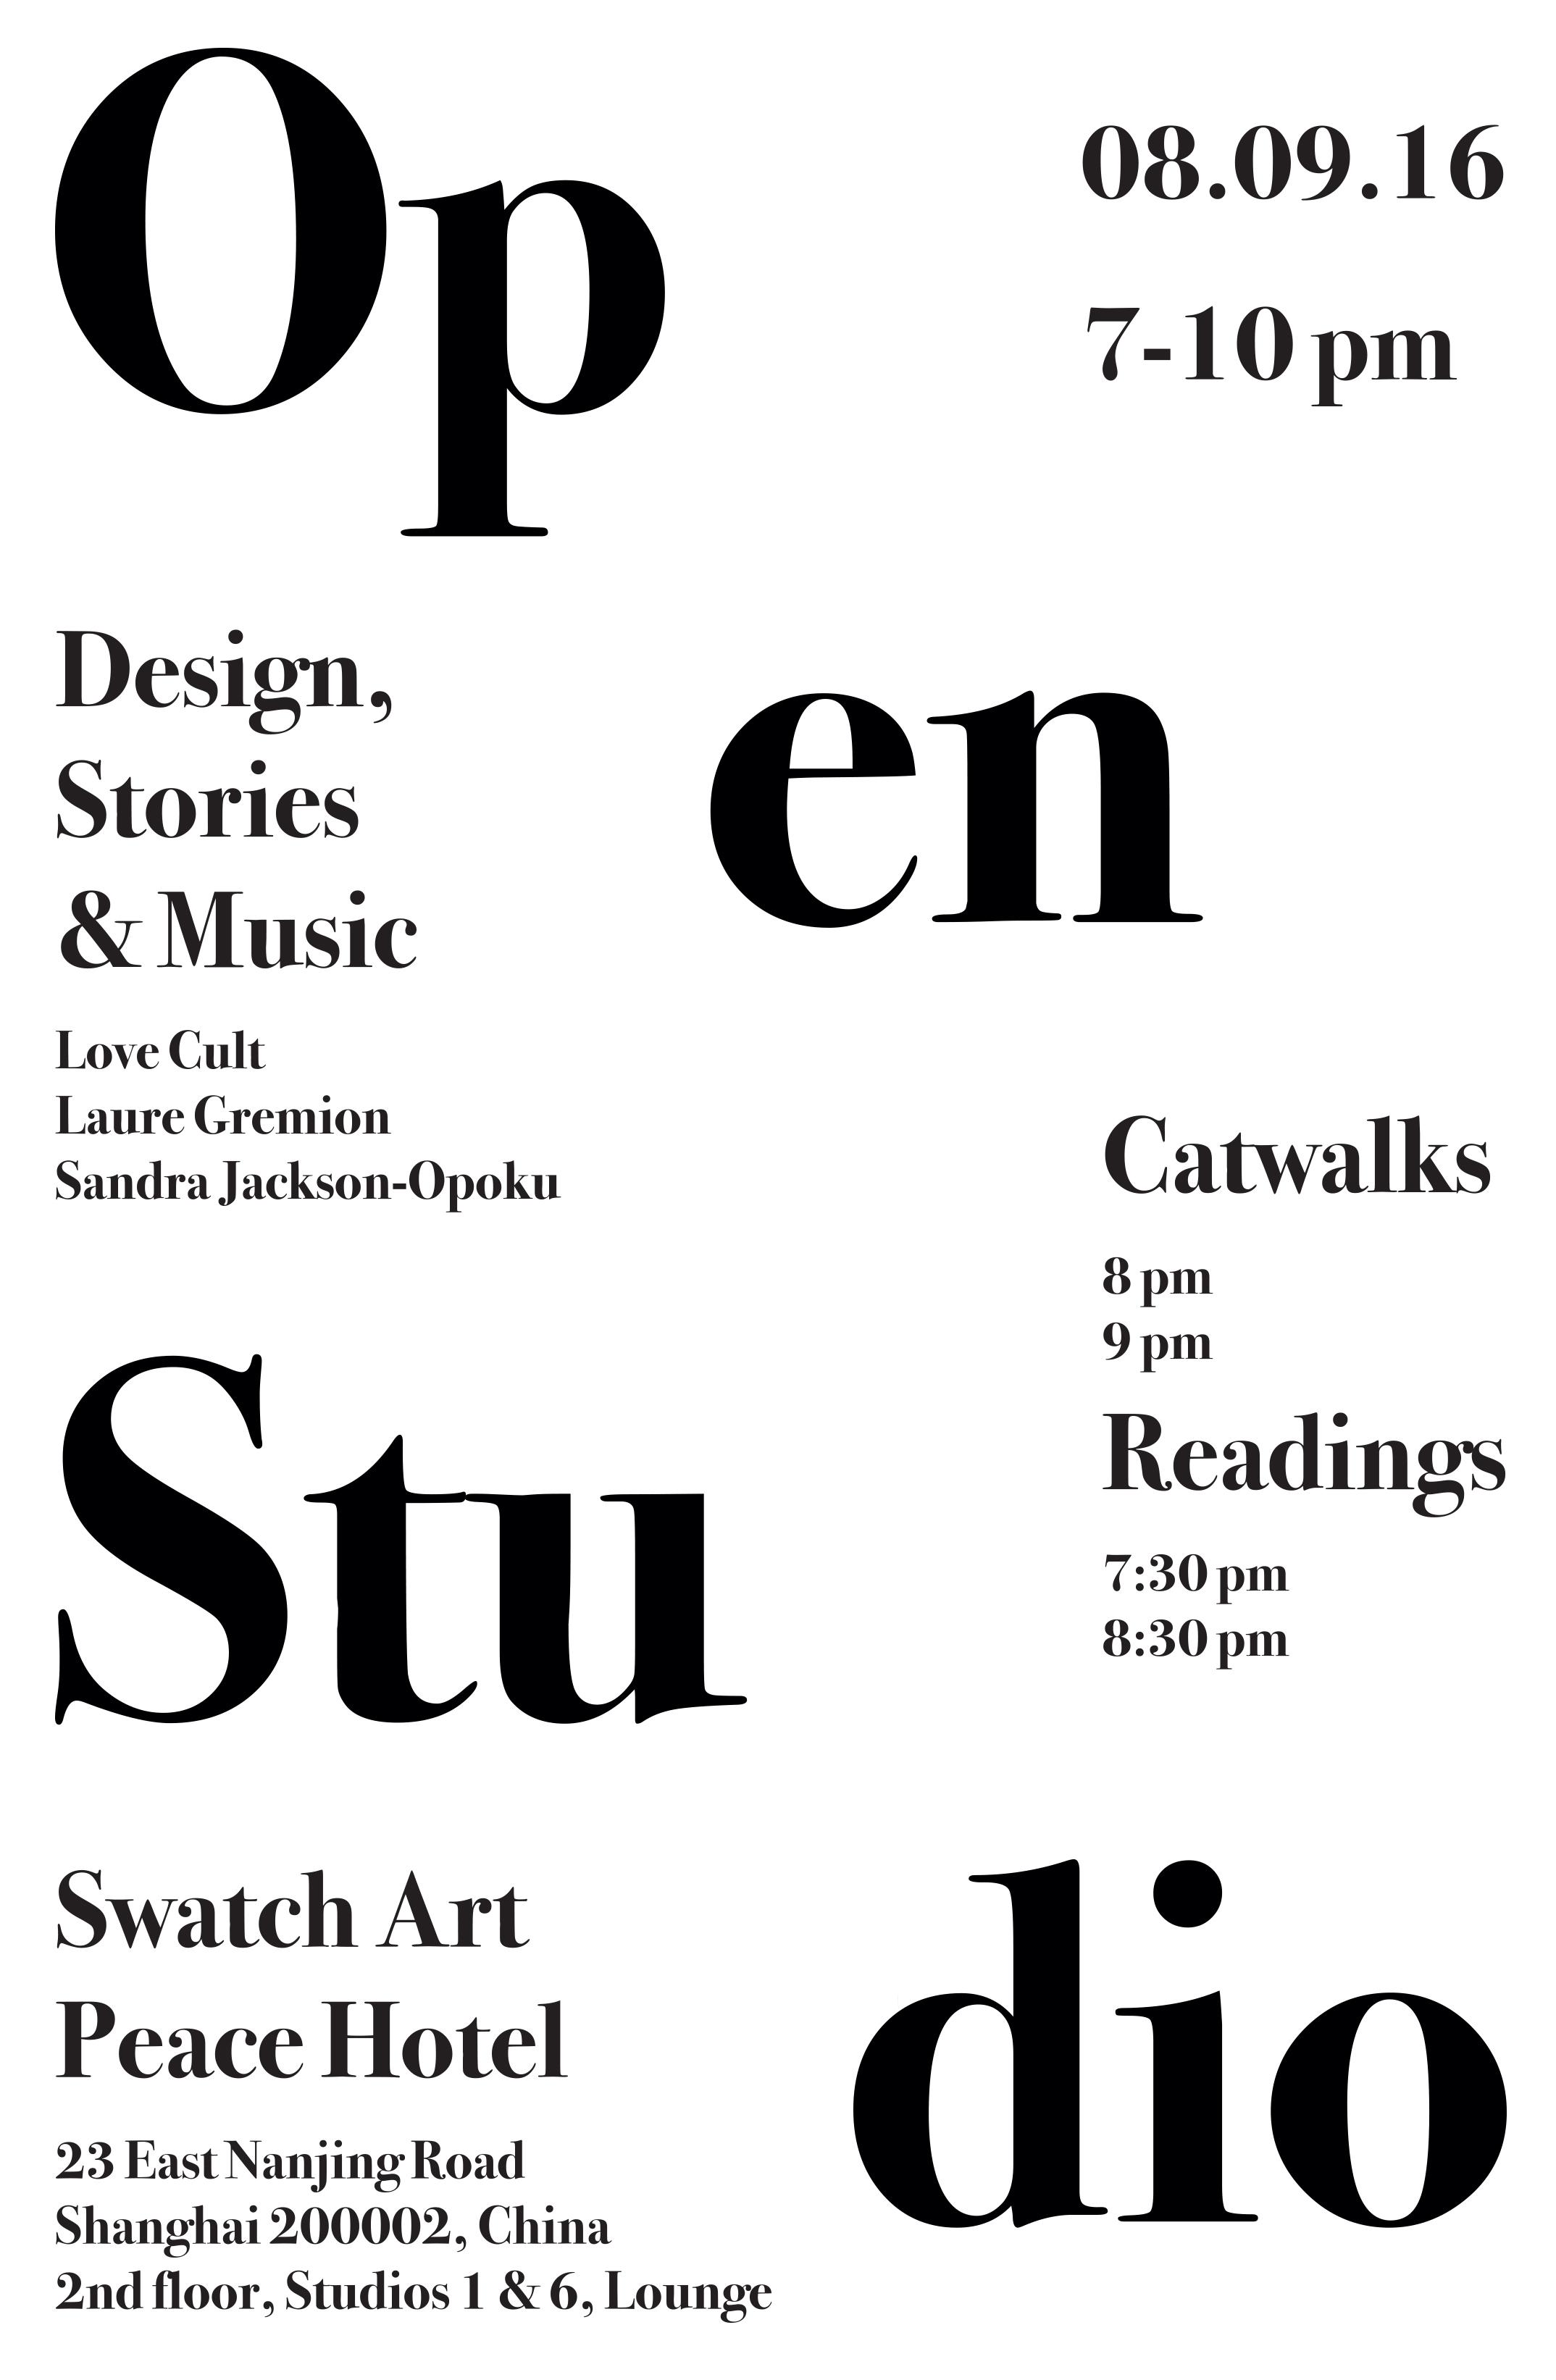 Open Studio Catwalk at Swatch Art Peace Hotel, Shanghai, China, 08.09.2016